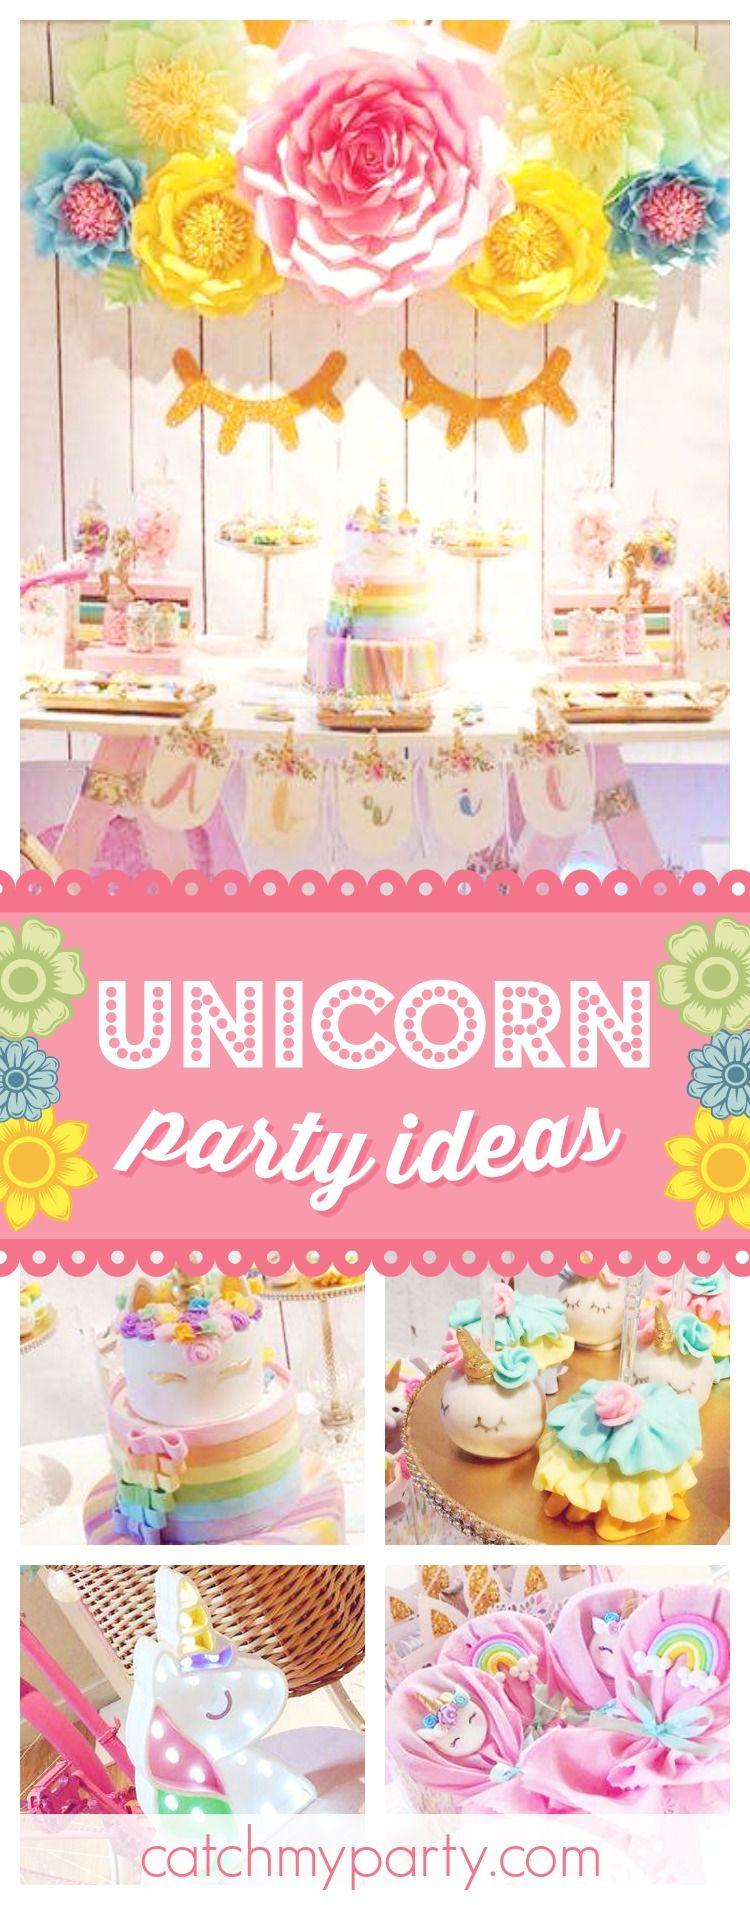 unicorn unicornio birthday sleepy eyes unicorn. Black Bedroom Furniture Sets. Home Design Ideas